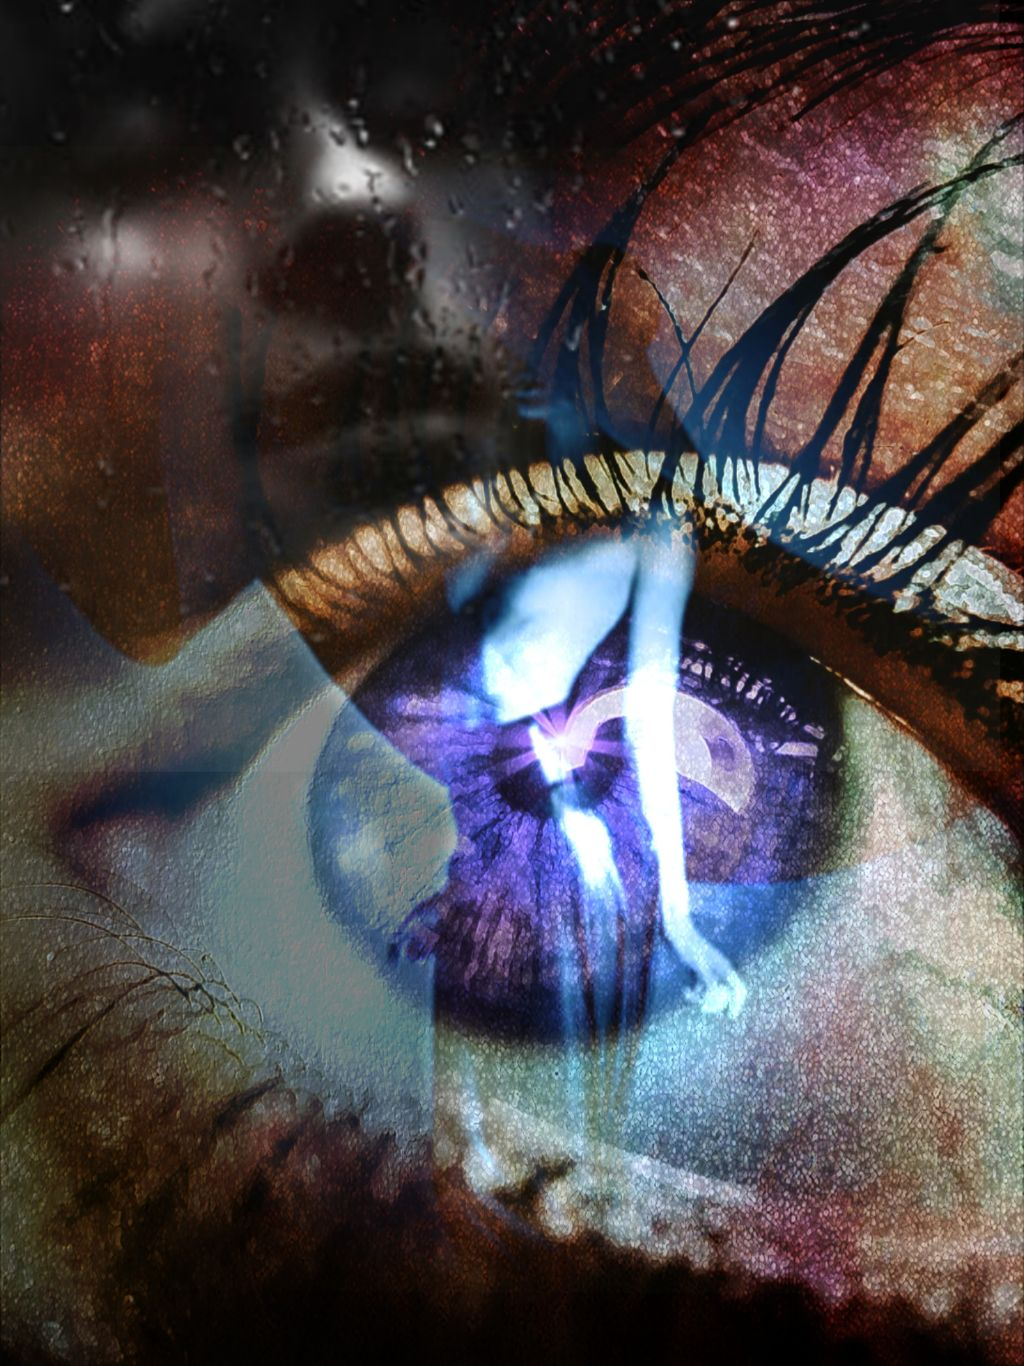 #freetoedit    Eye and emotions  #thoughts #feelings #face #woman #eye #dreams #tripleexposure